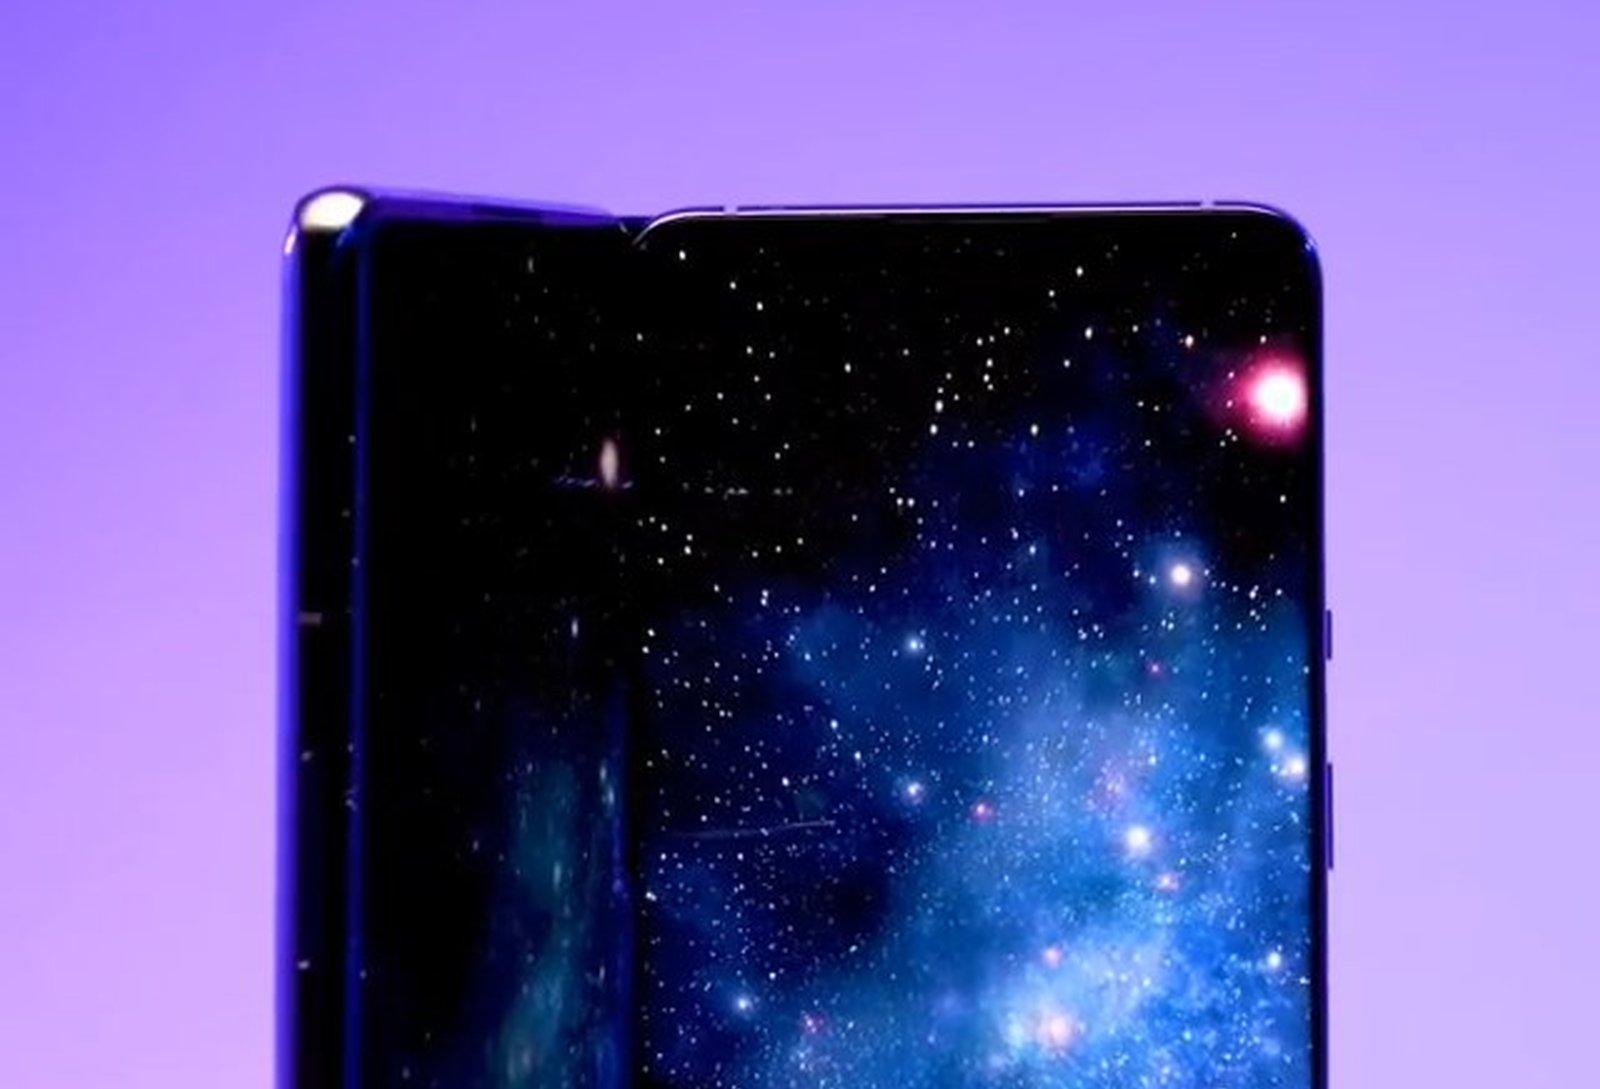 OnePlus 'dual-screen' teaser image